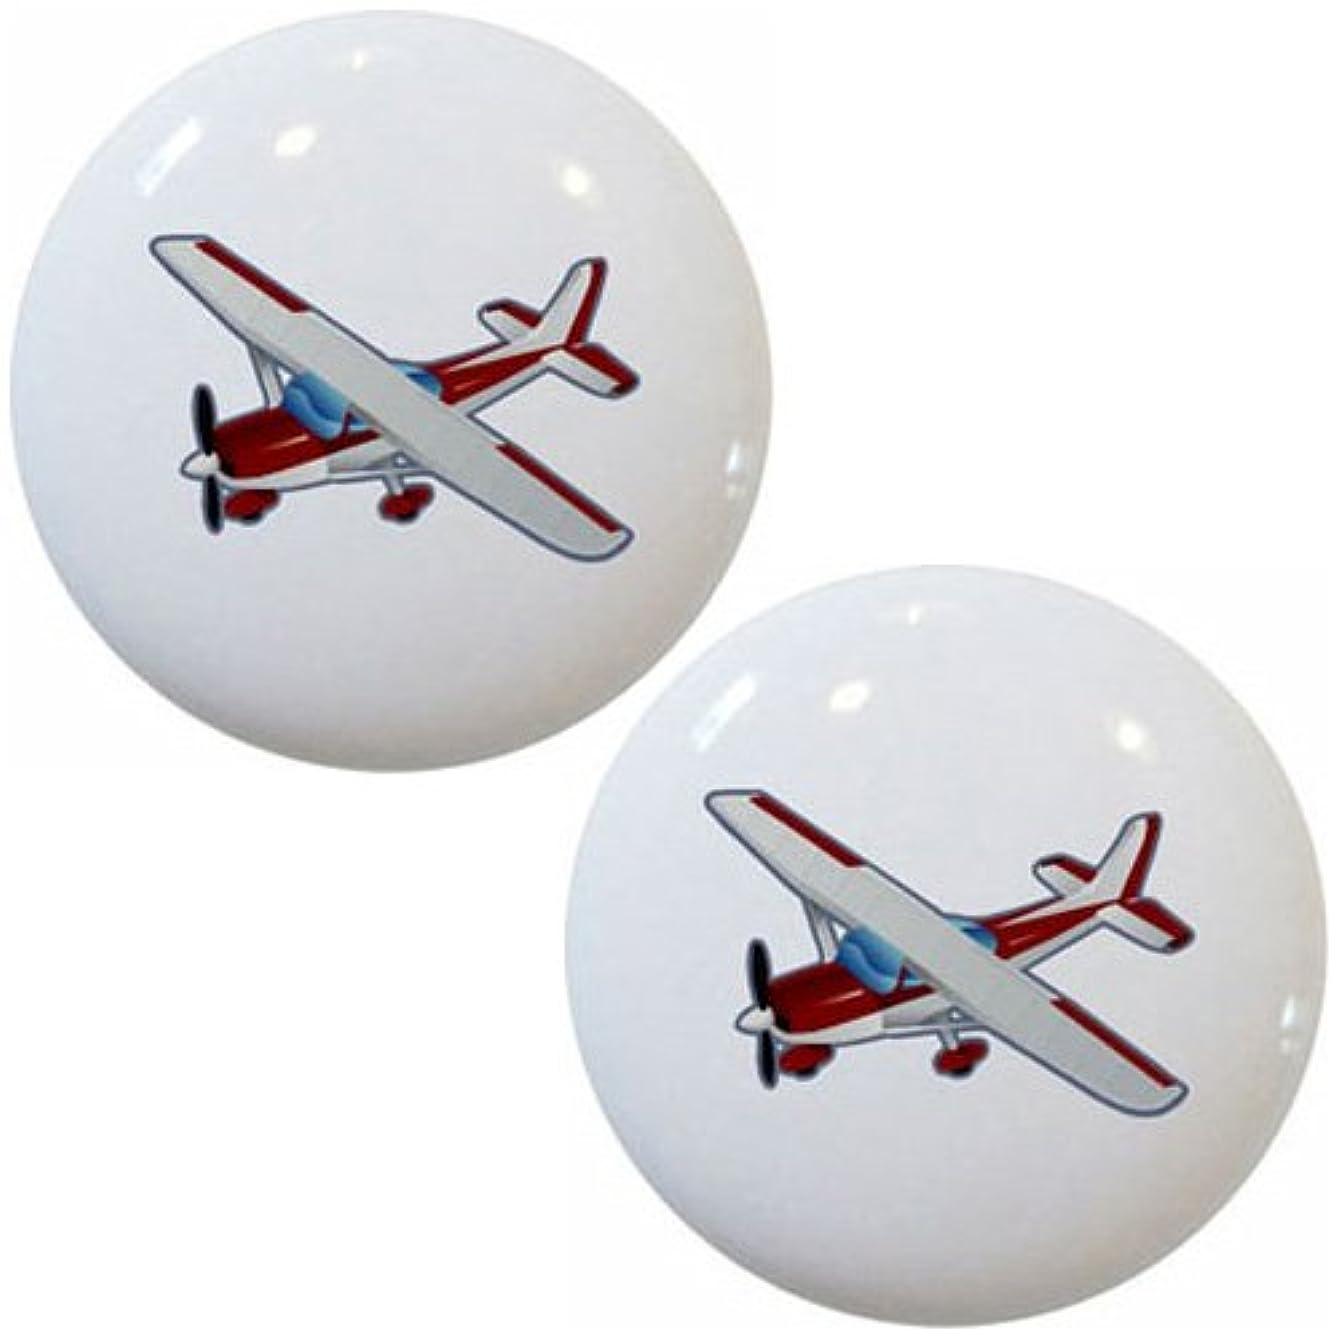 Red Airplane Aviation Ceramic Cabinet Drawer Pulls Knobs (Set of 2 Knobs)